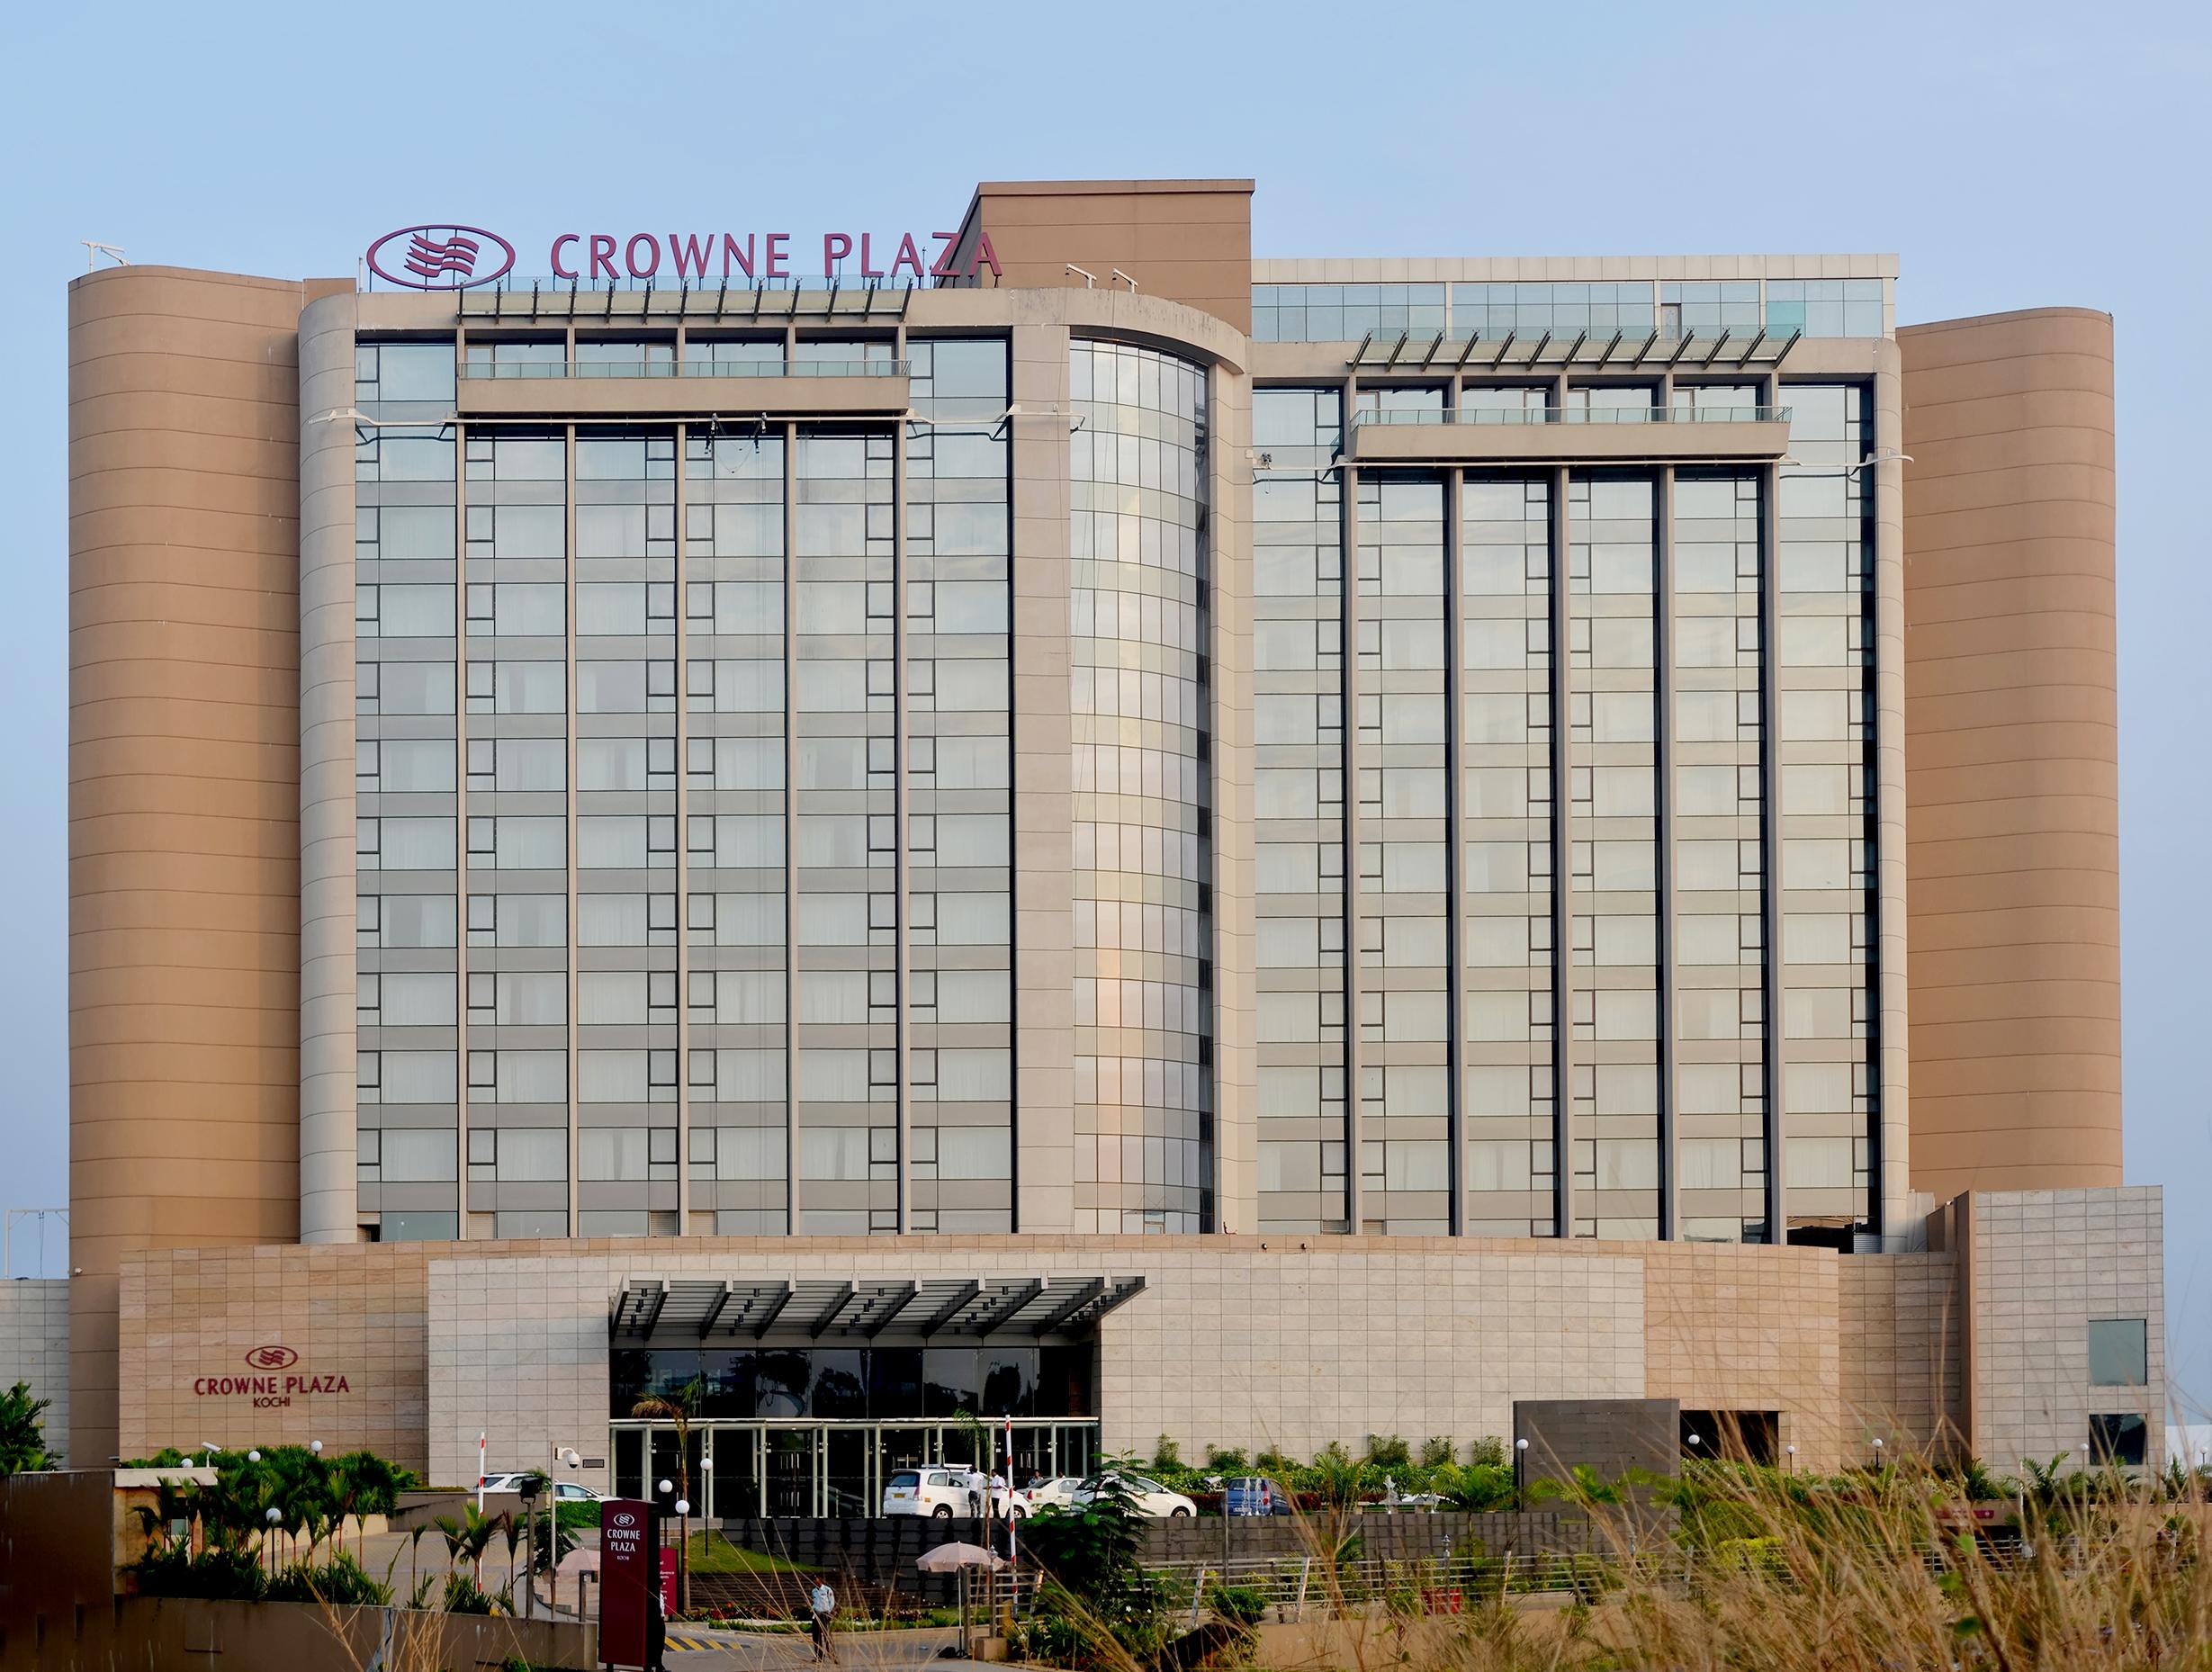 Crowne plaza nha trang casino igt yahoo message boards